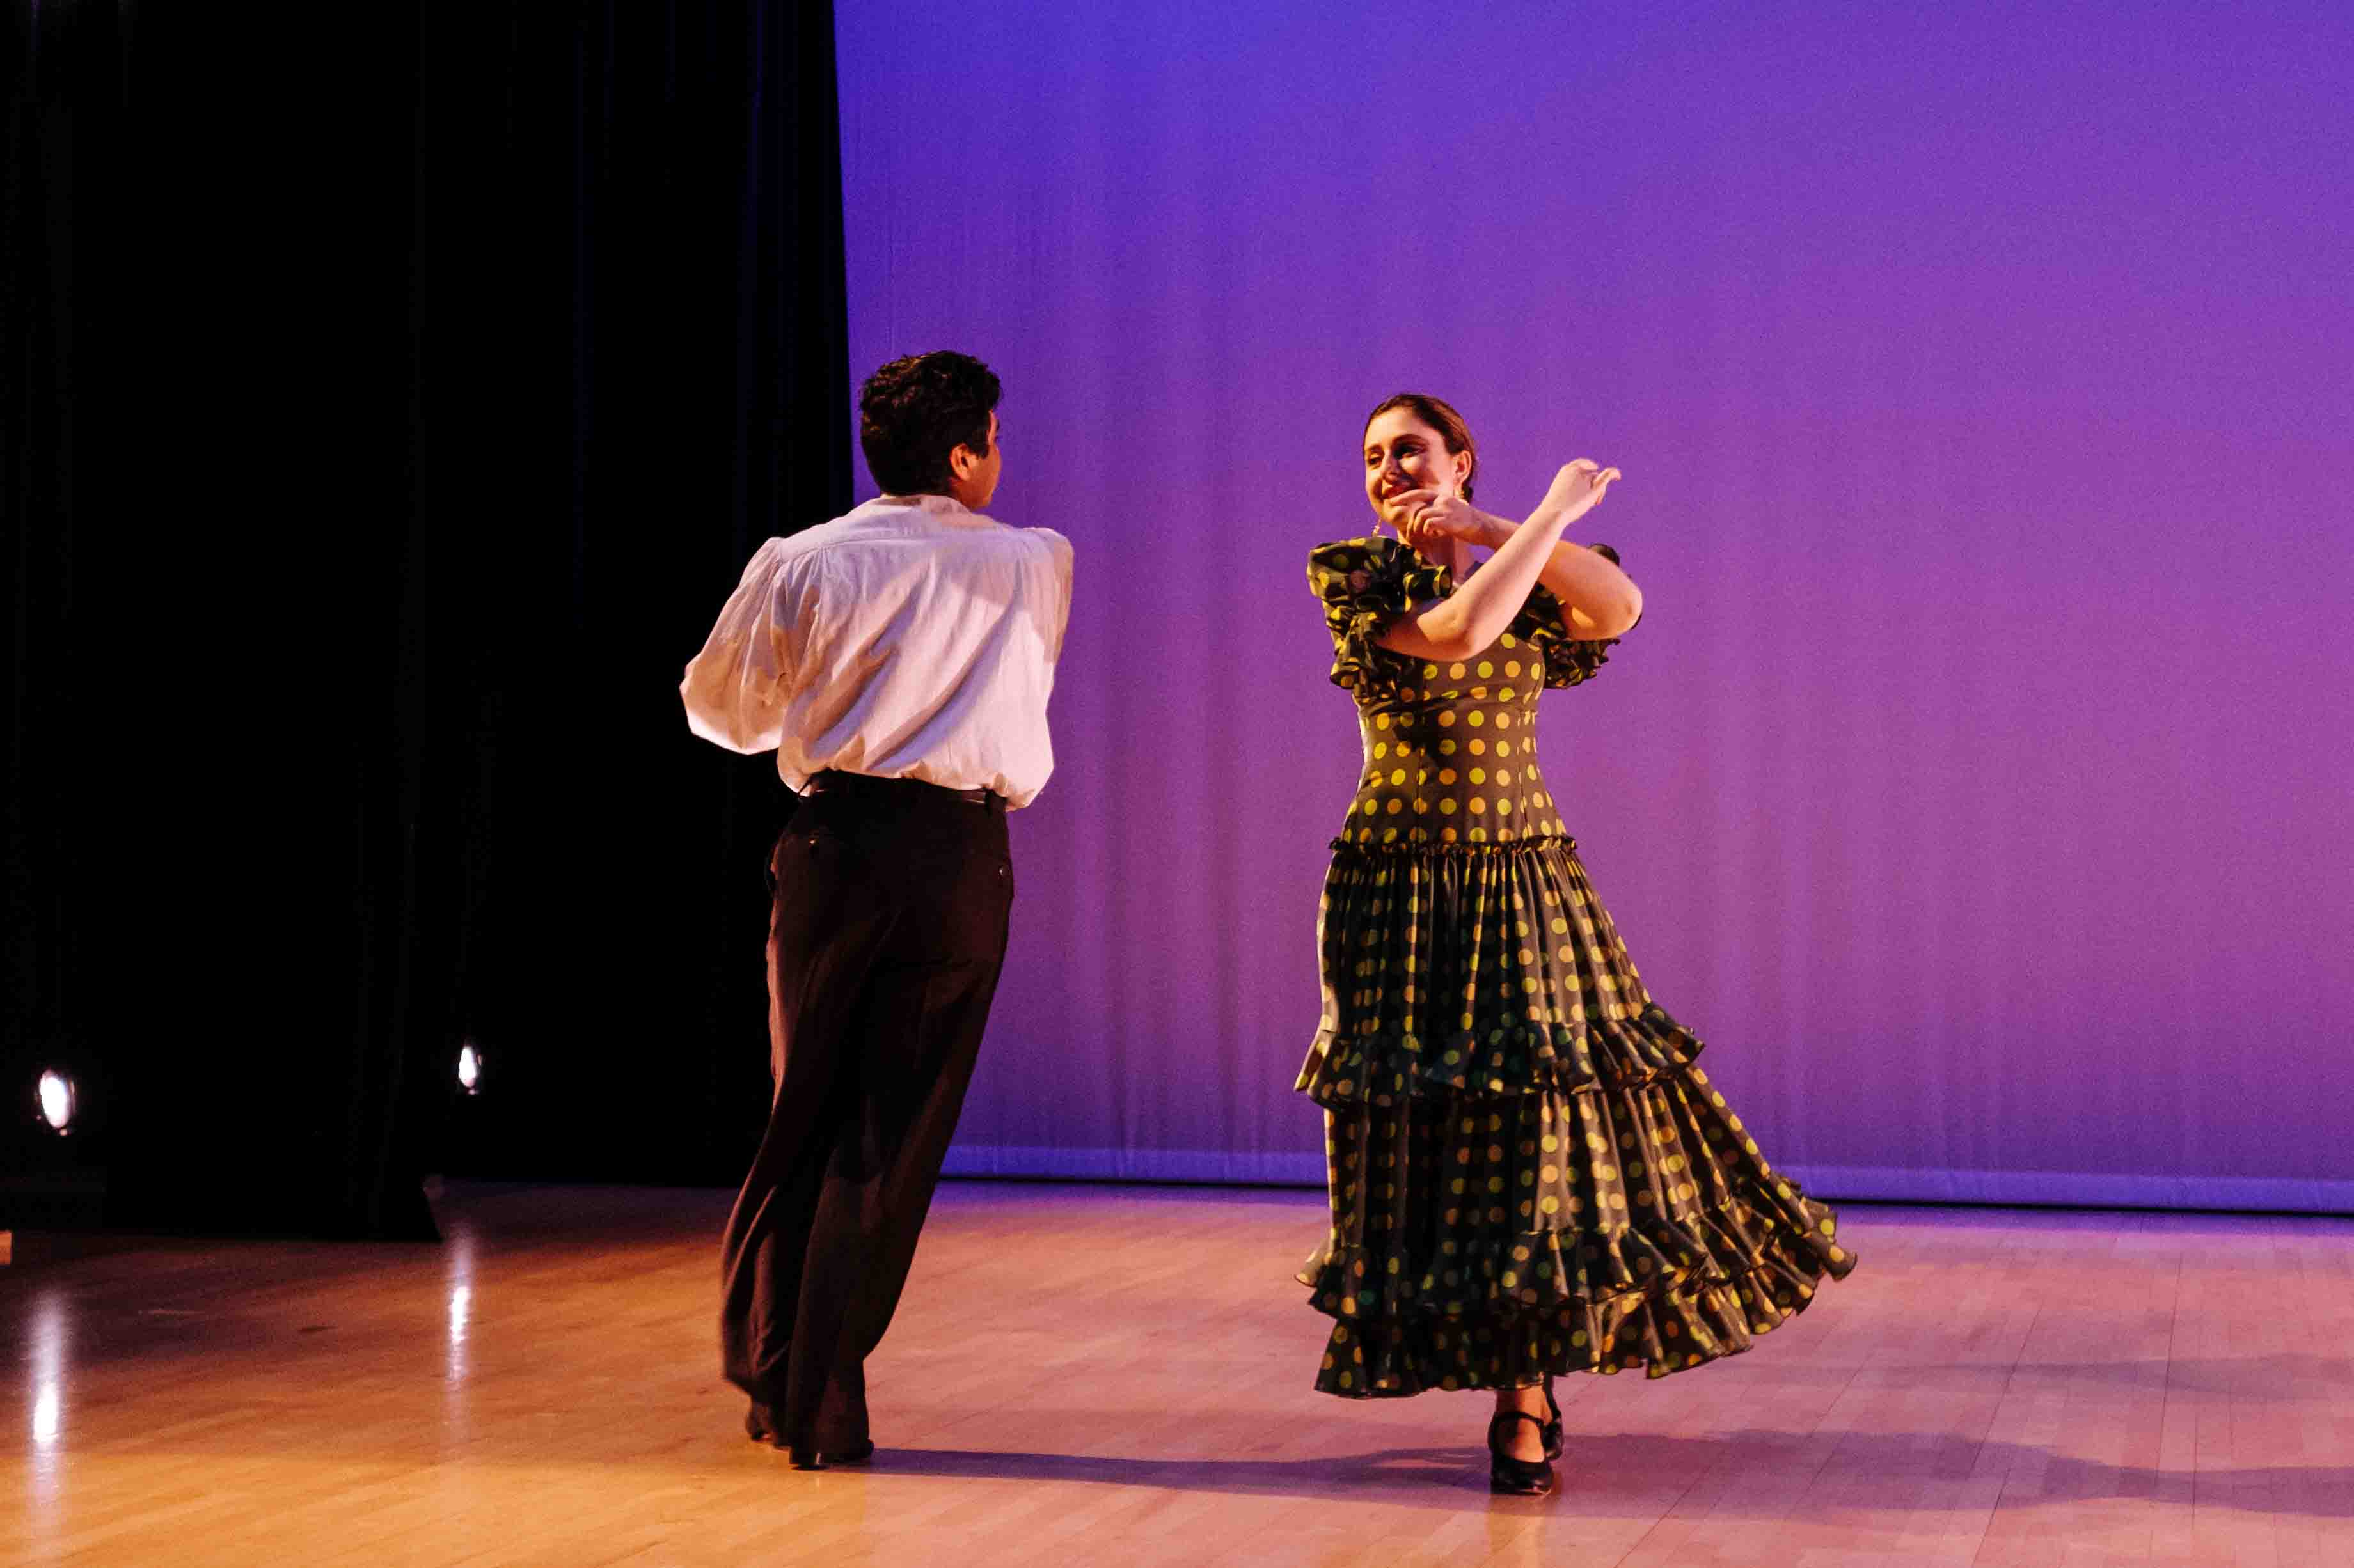 Veselica 2018 Photo Gallery – Dance Photo Galleries